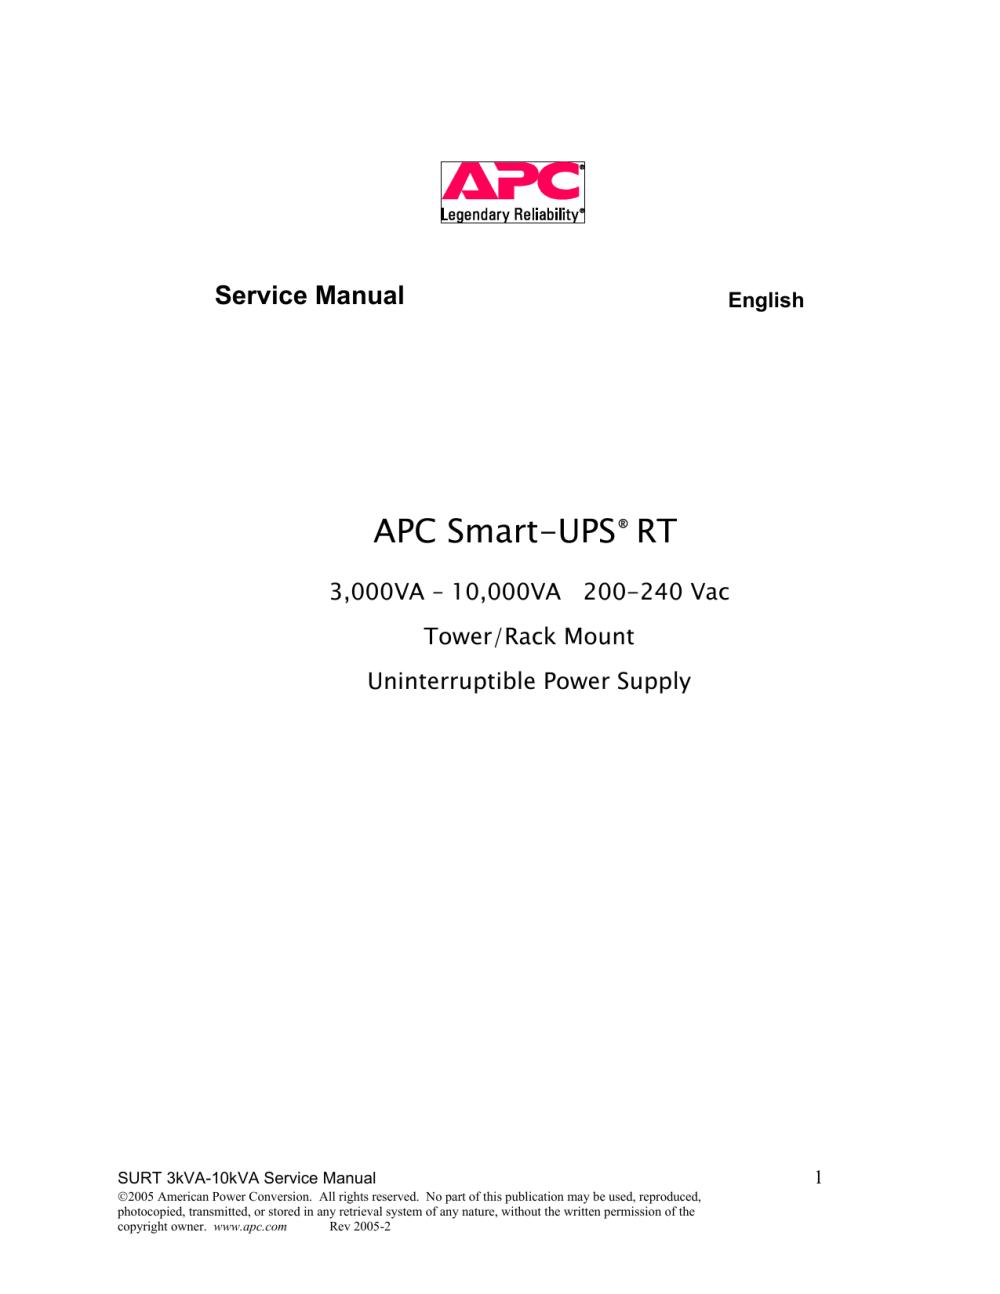 medium resolution of surt service manual rma rev2 apc